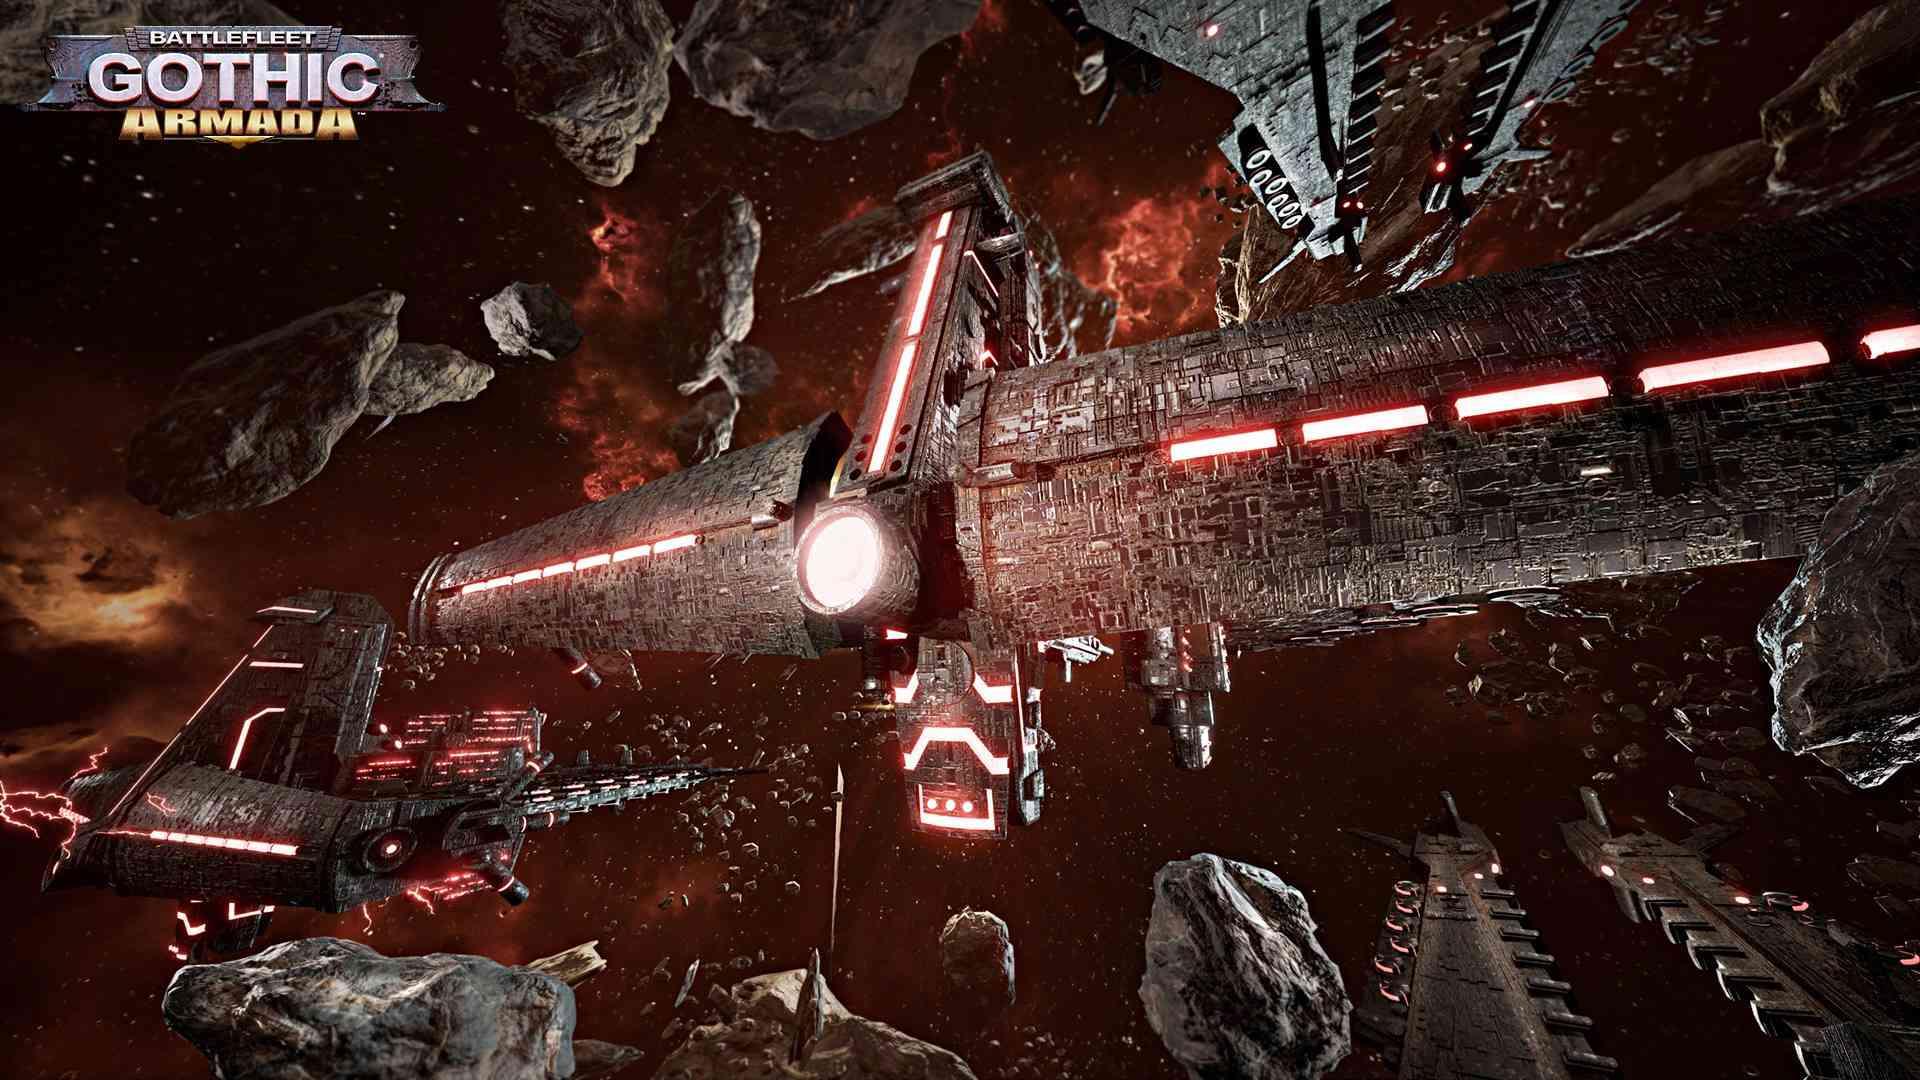 [Jeu vidéo] Battlefleet Gothic : Armada - Page 18 14242410